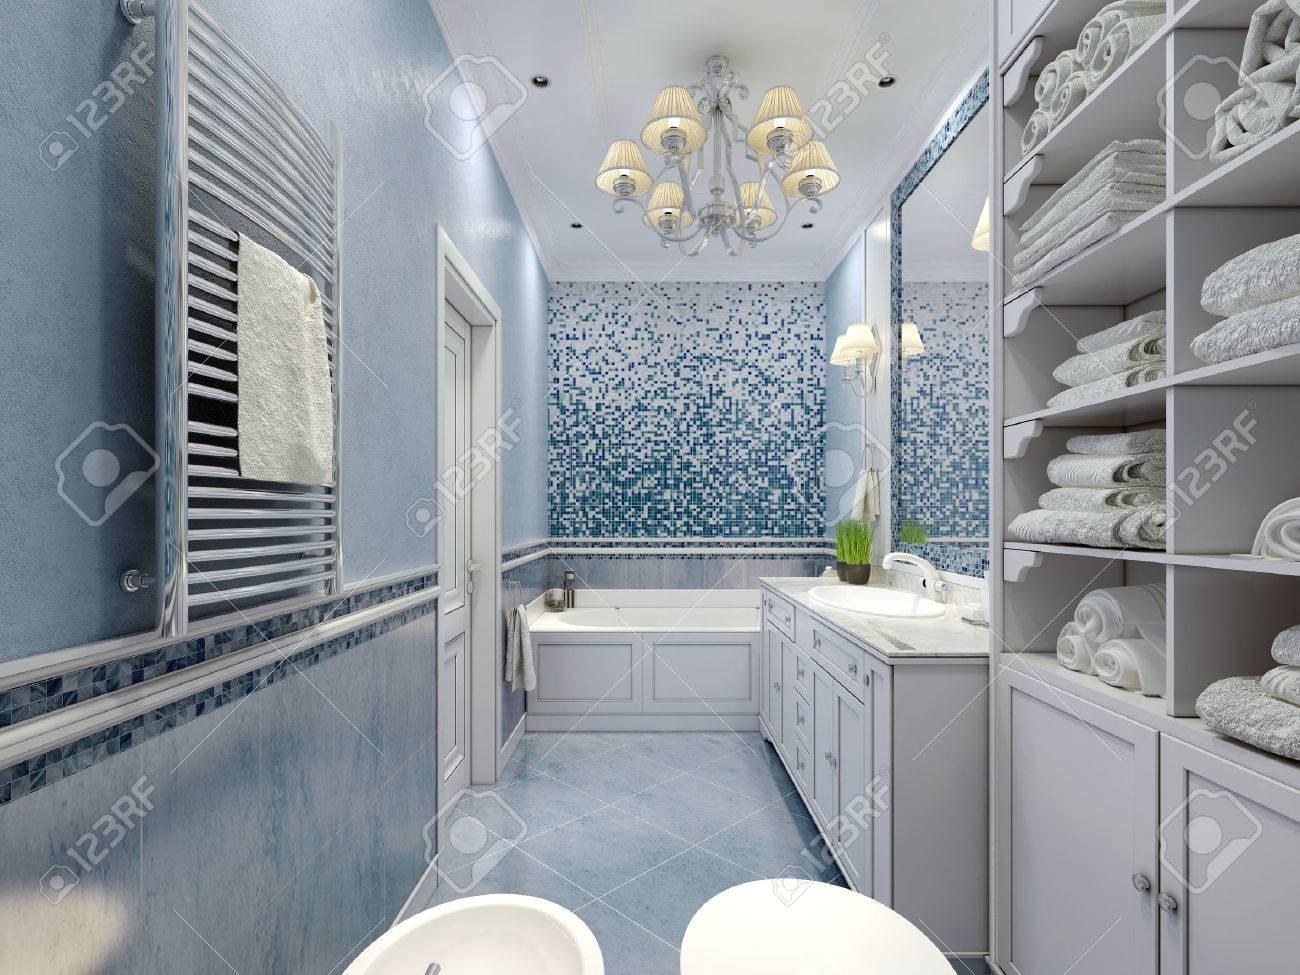 Estilo Clásico Azul Amplio Cuarto De Baño. Bañera, Inodoro, Bidé ...